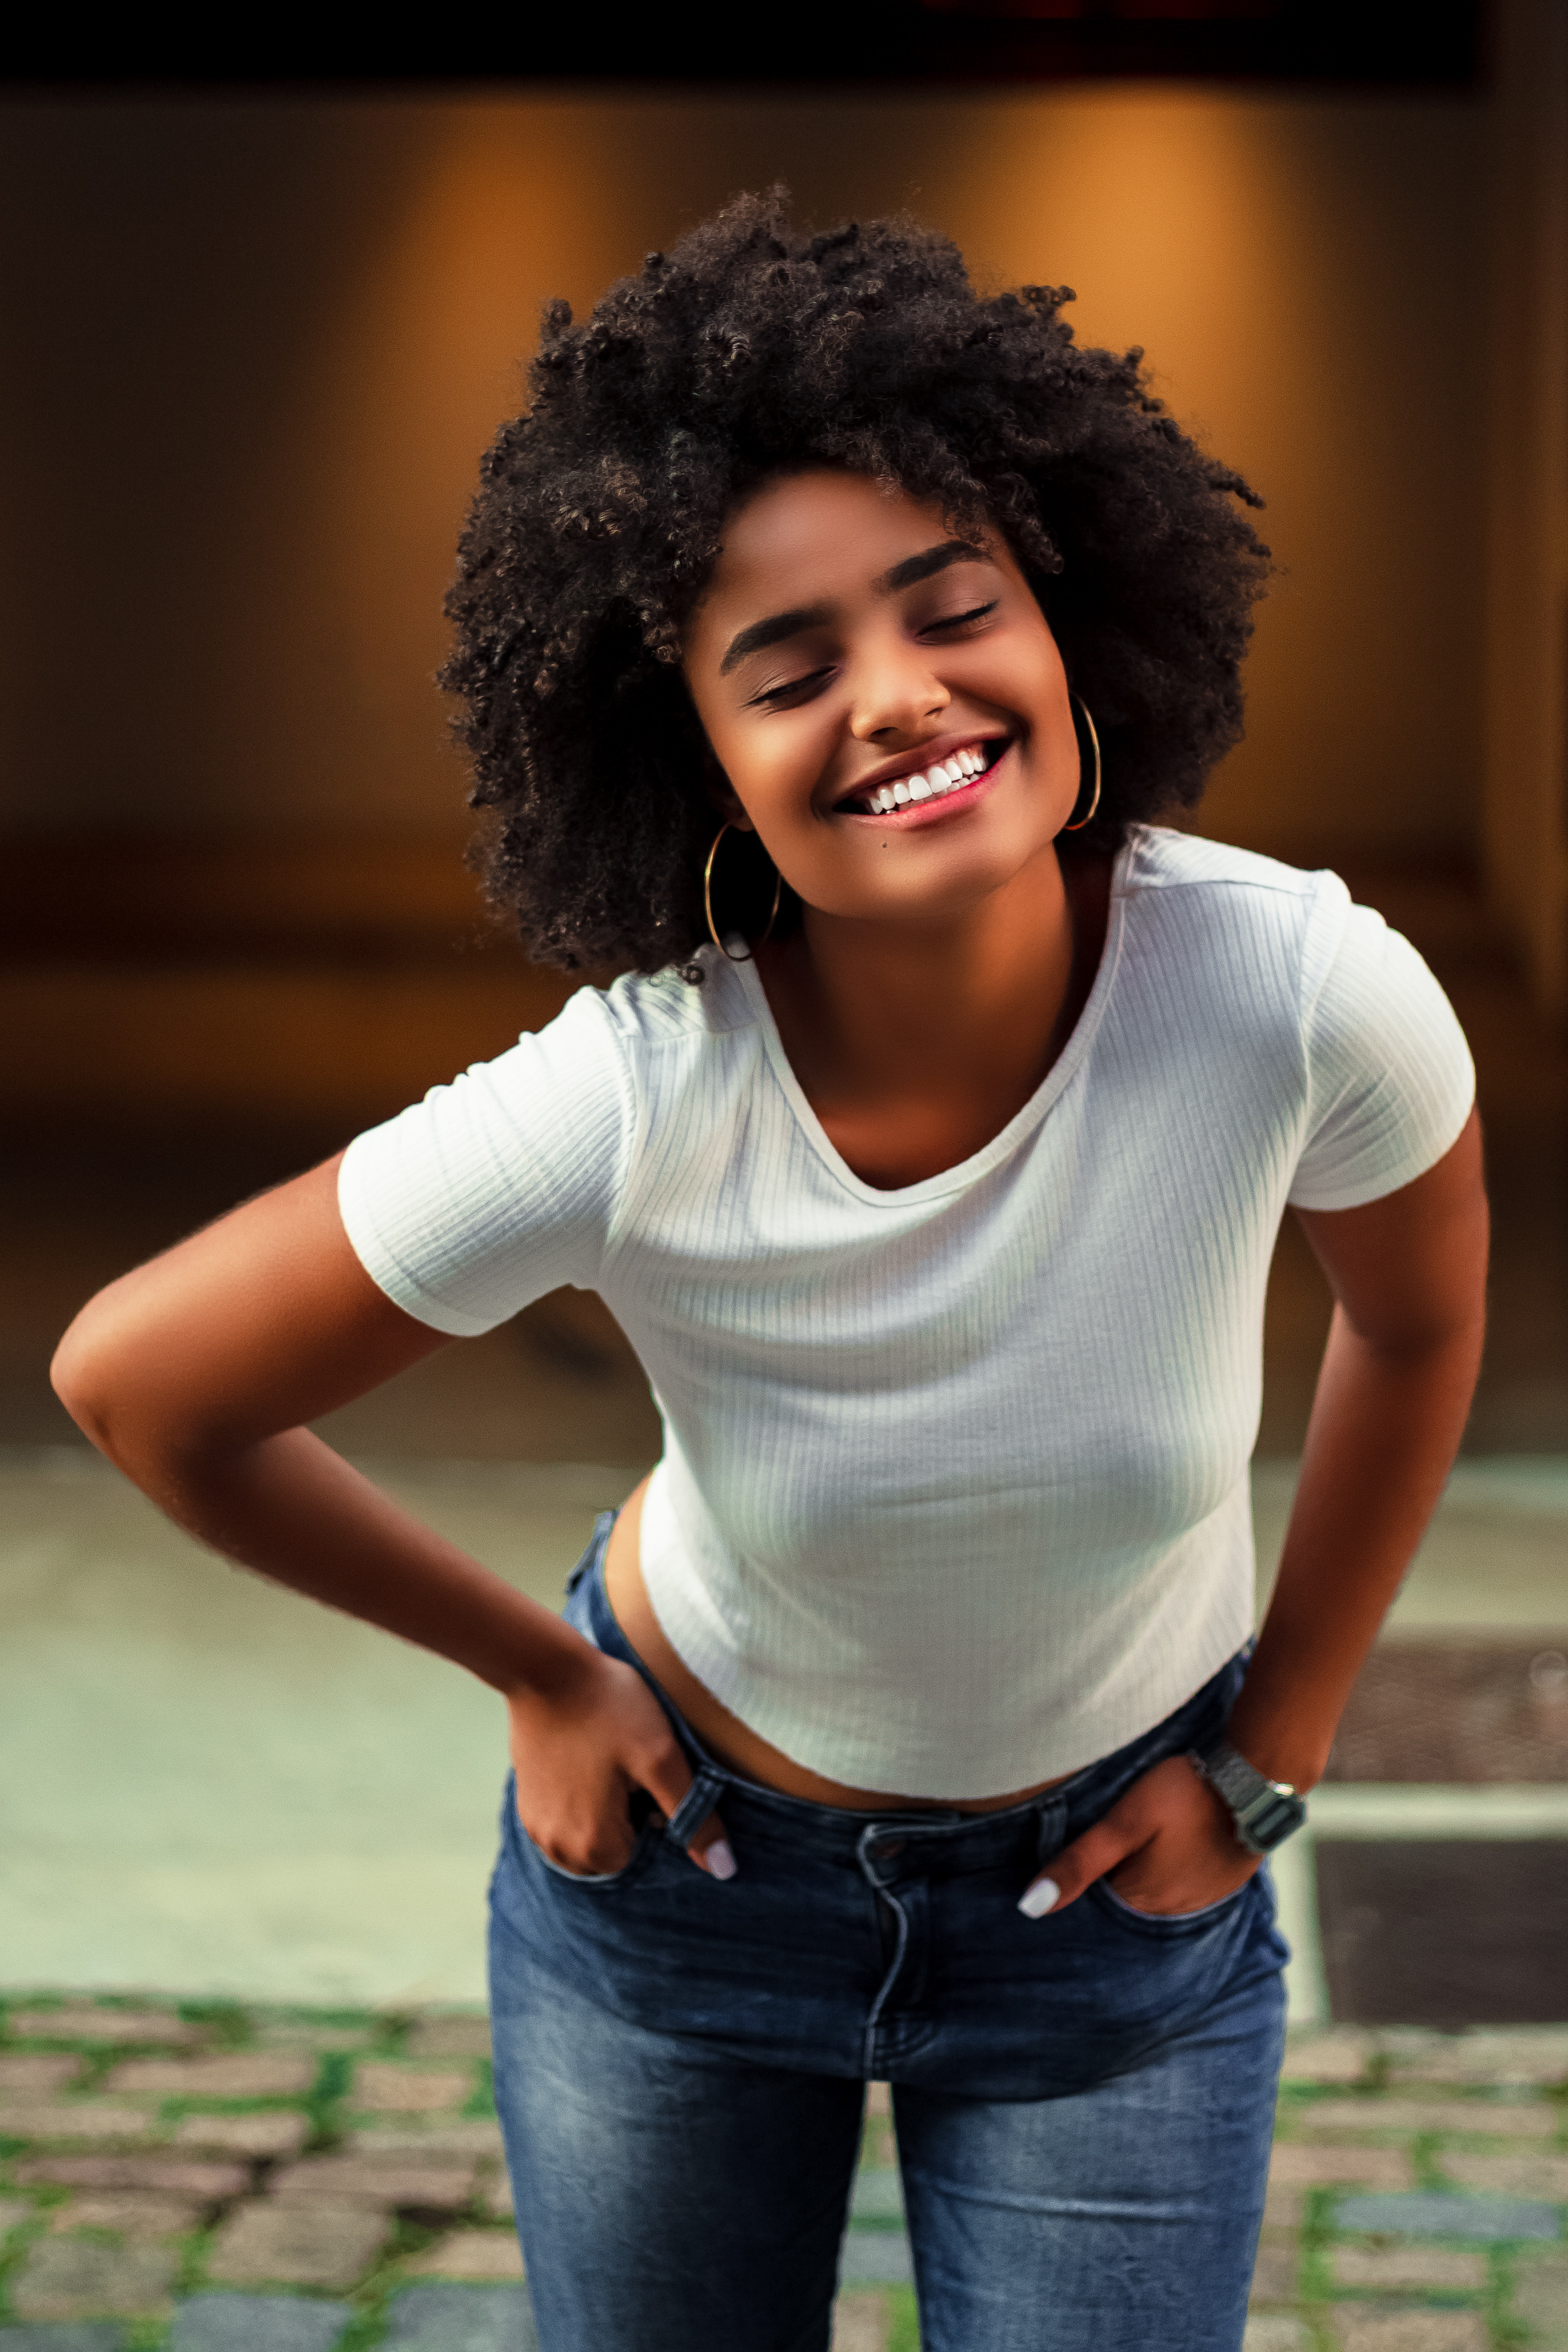 afro-hair-blur-depth-of-field-2535859